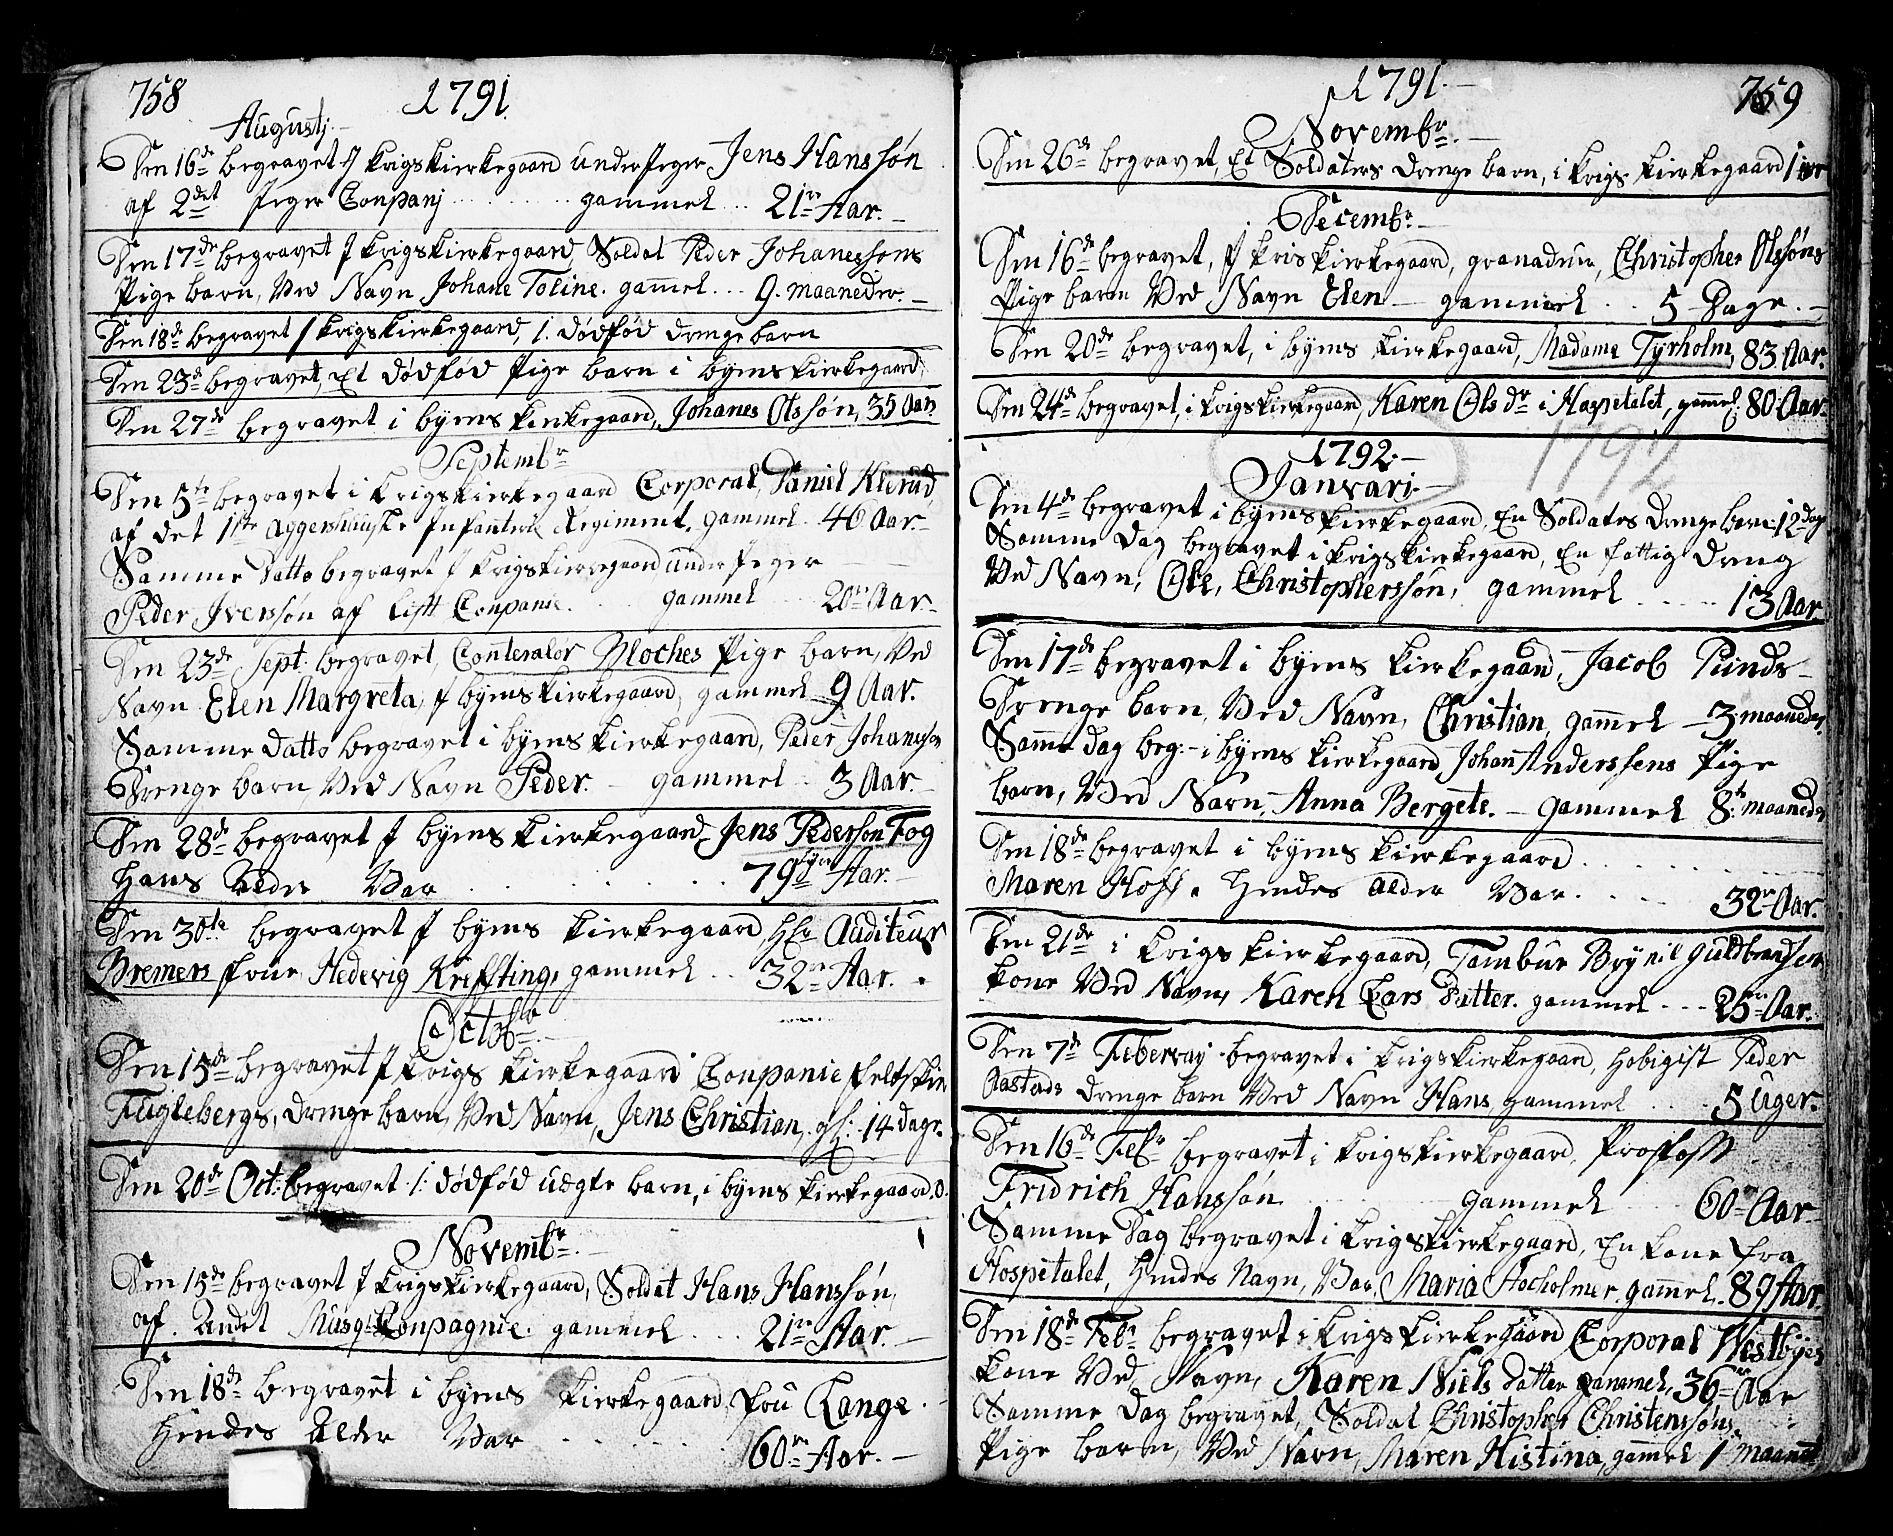 SAO, Fredrikstad prestekontor Kirkebøker, F/Fa/L0002: Ministerialbok nr. 2, 1750-1804, s. 758-759